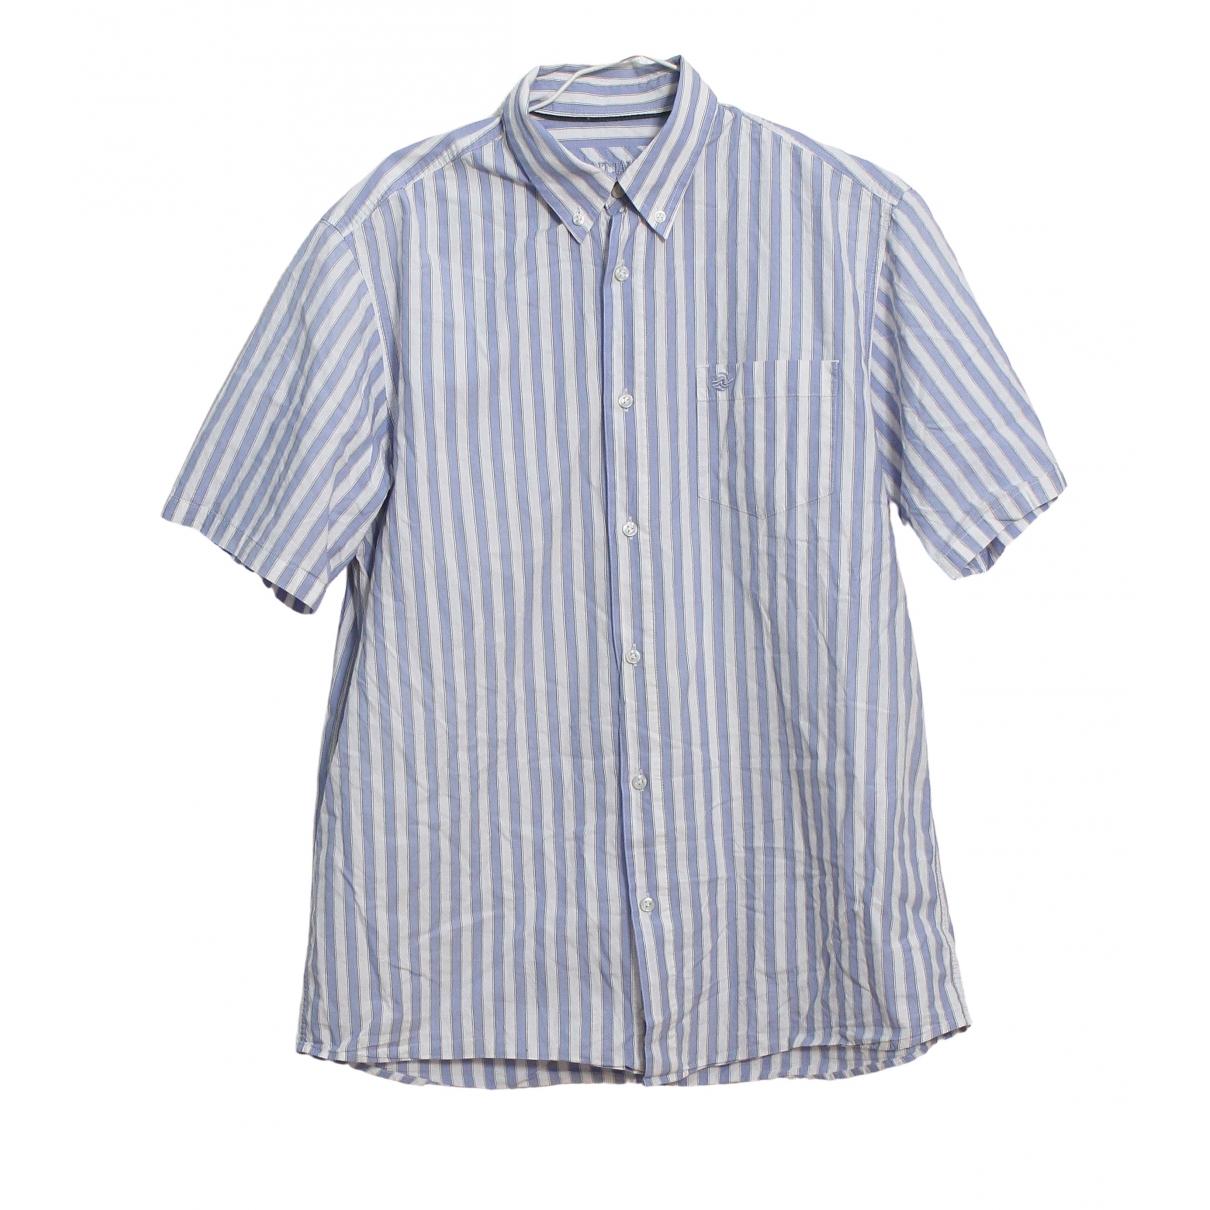 Camisas Saint James